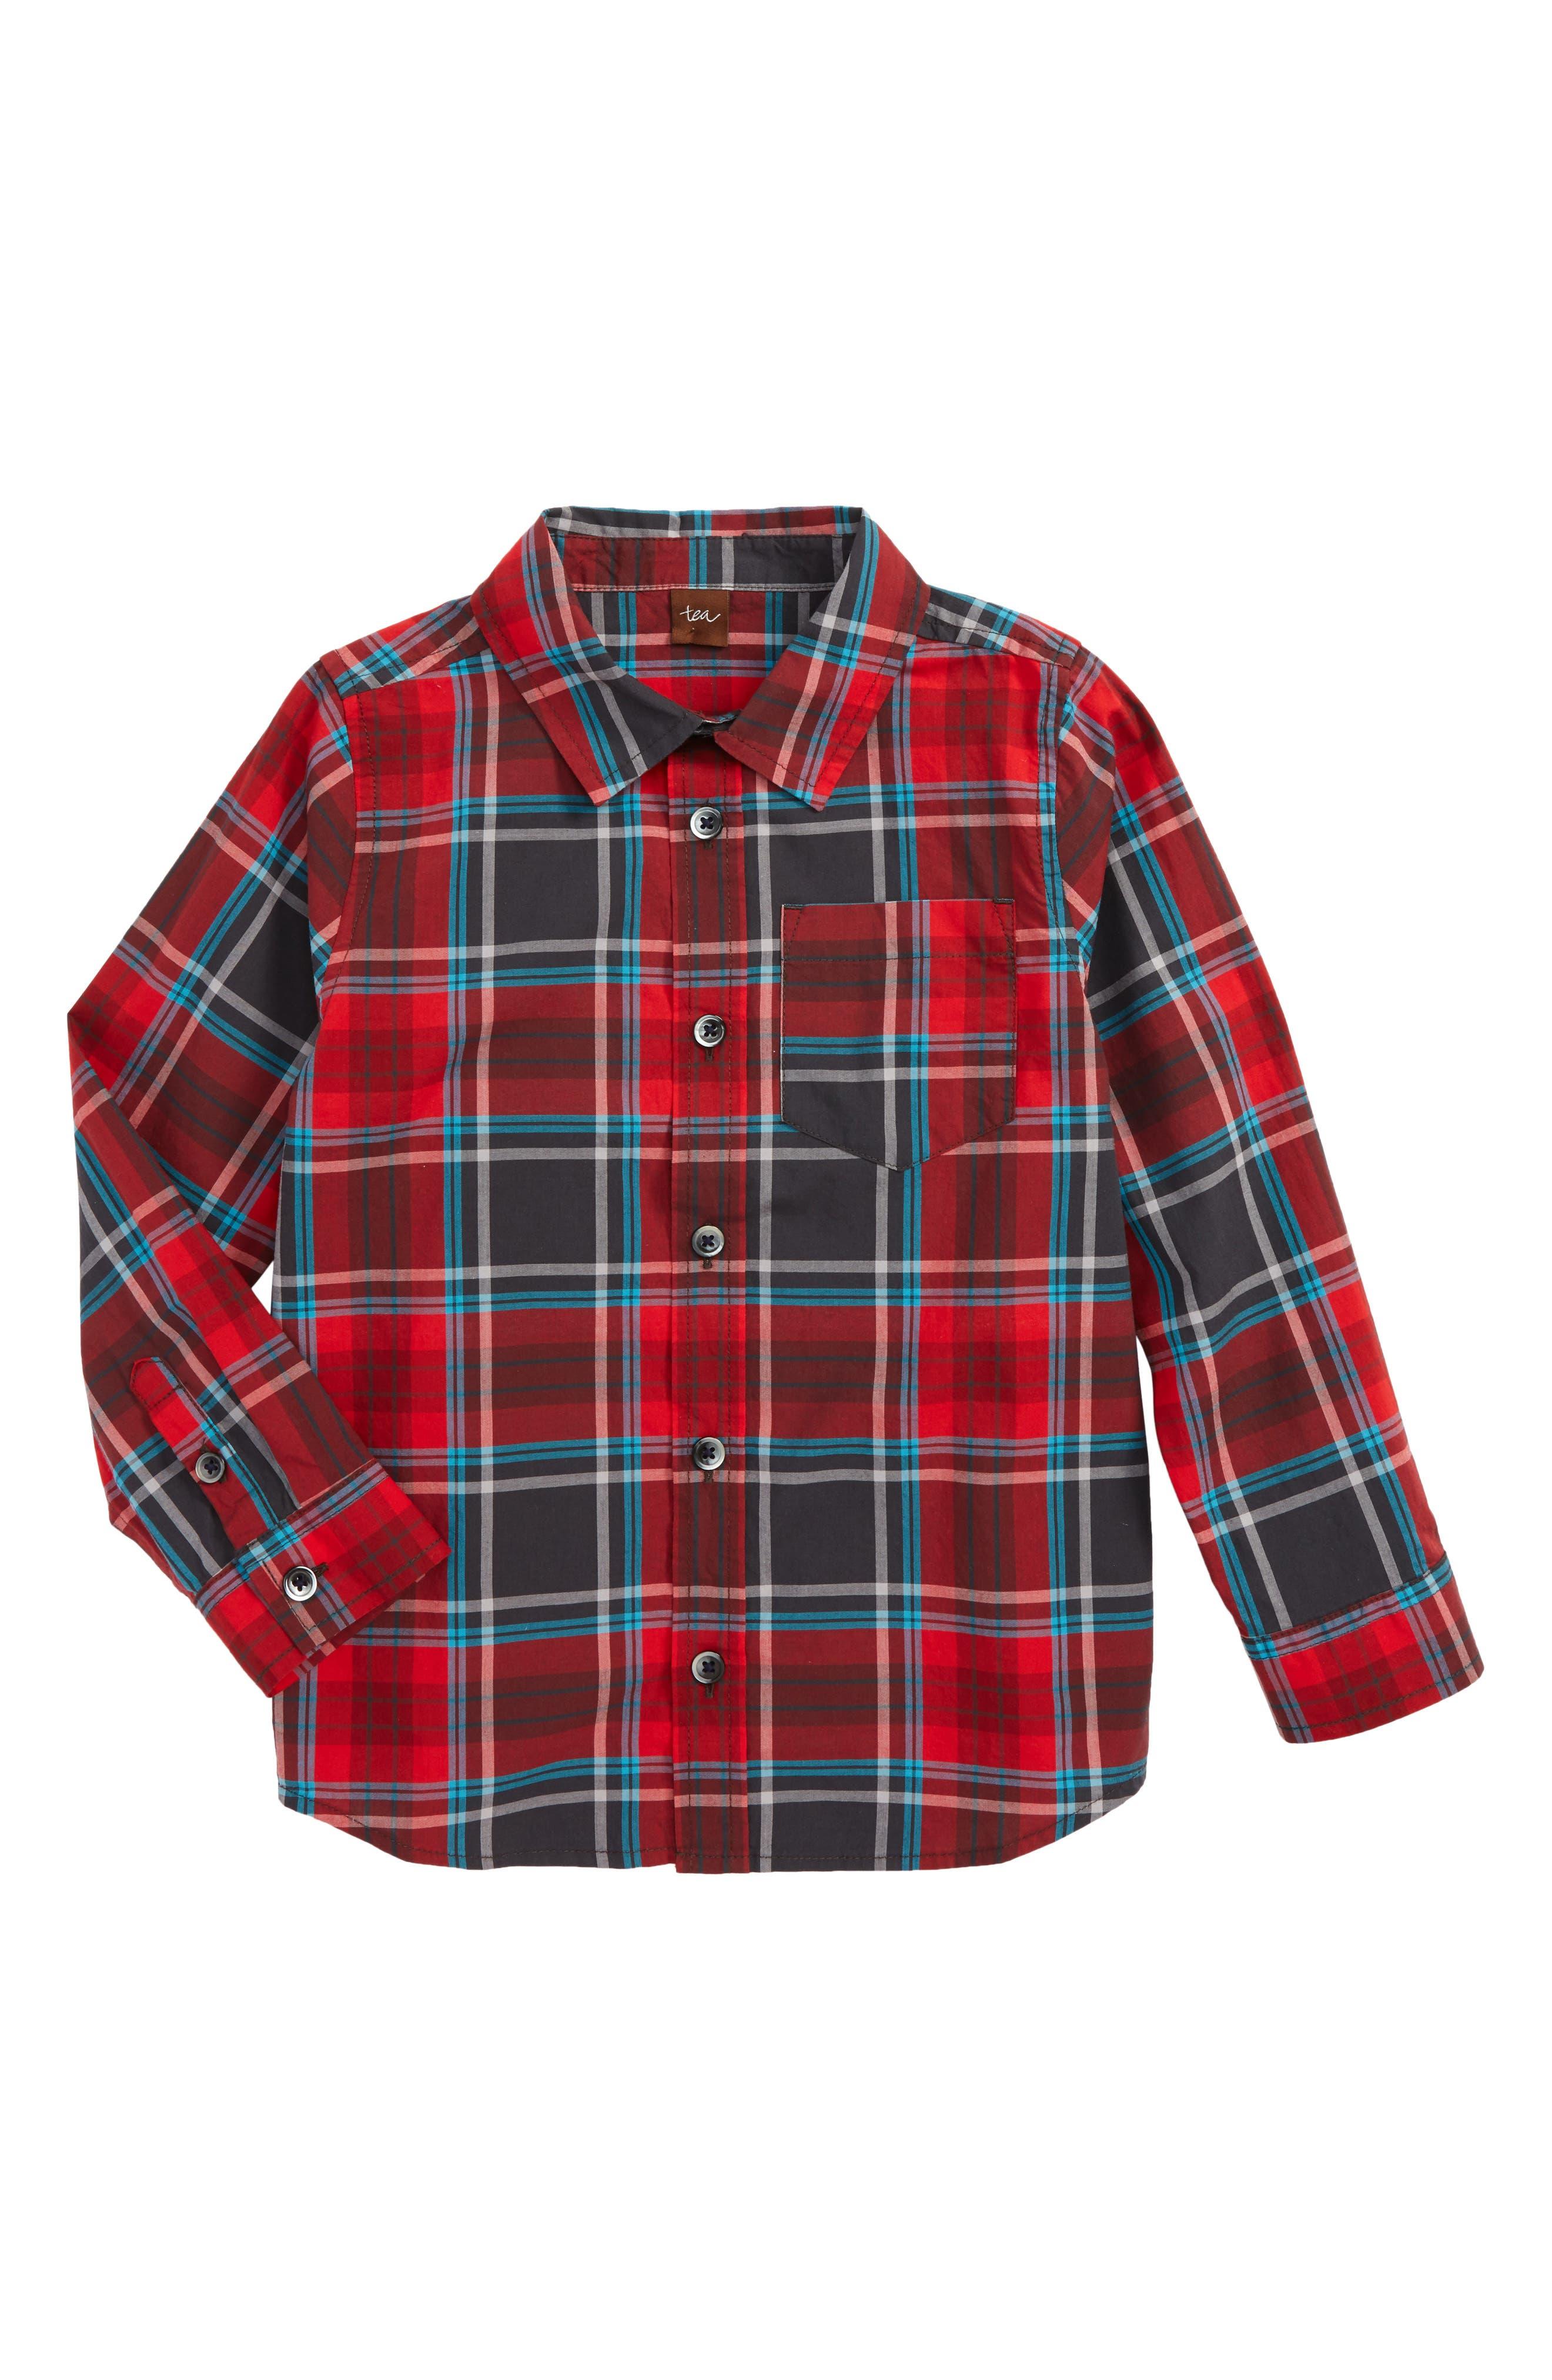 Main Image - Tea Collection Duncan Plaid Woven Shirt (Toddler Boys & Little Boys)